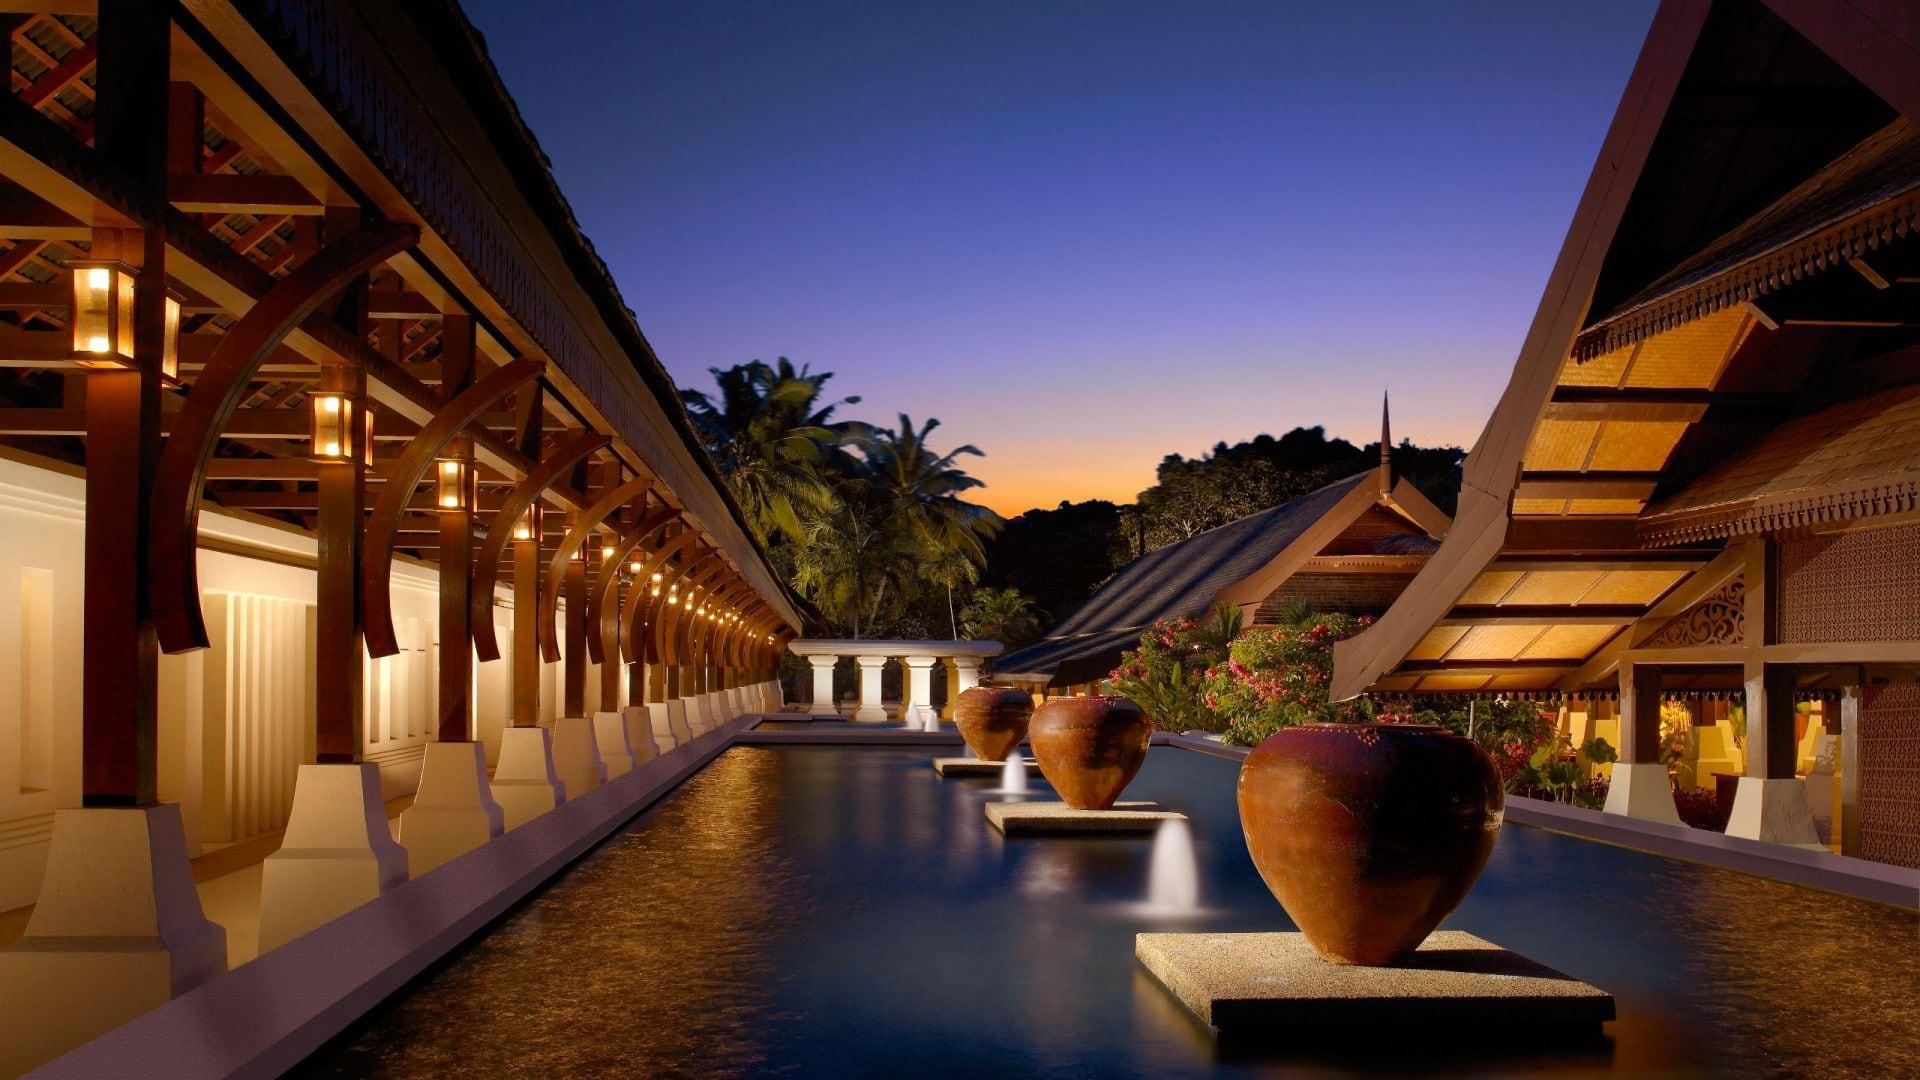 Tanjong Jara resort exterior at night